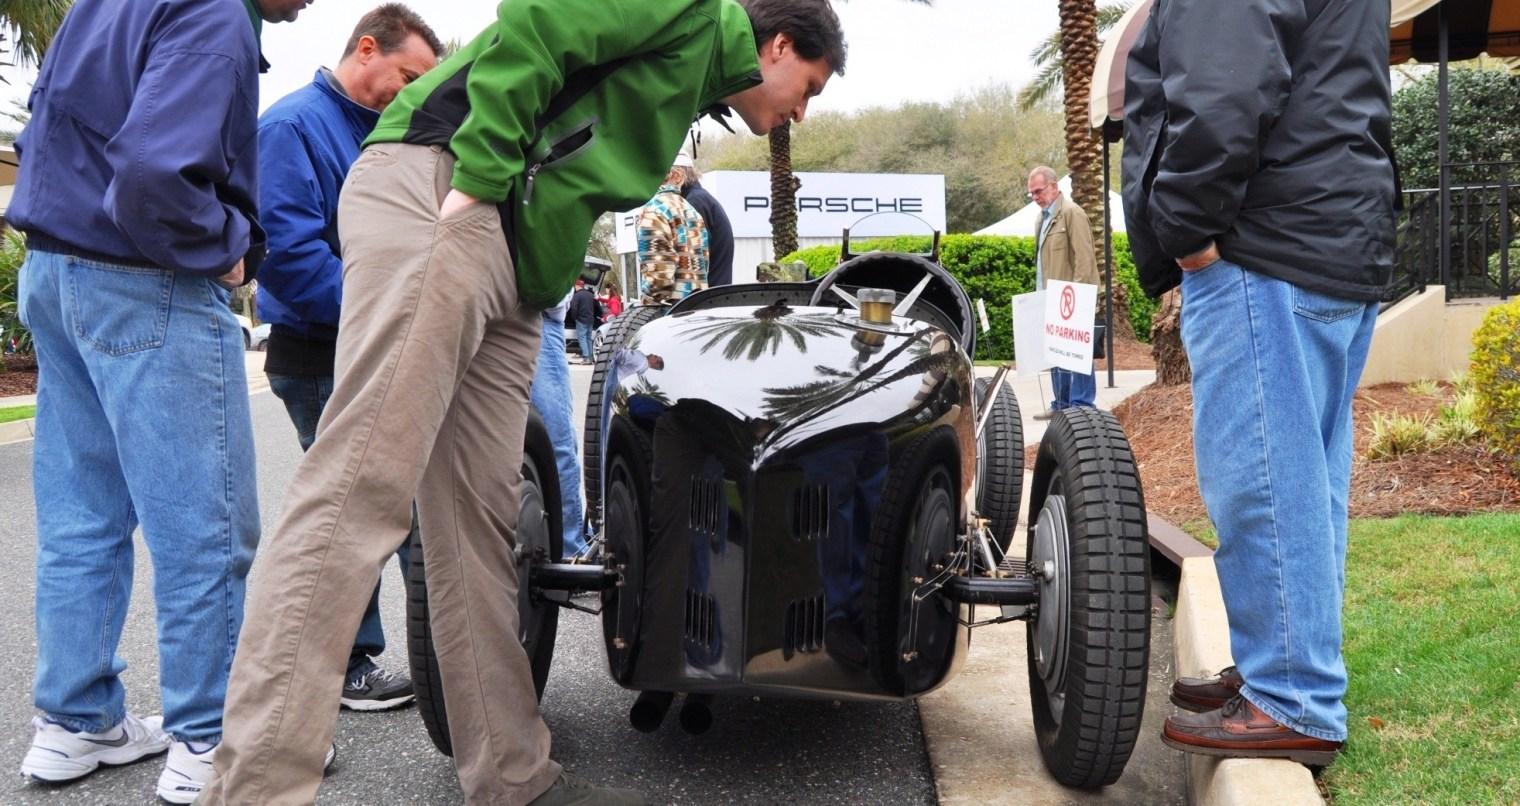 PurSang Argentina Shows Innovative Marketing with Street-Parked 1920s Bugatti GP Car18